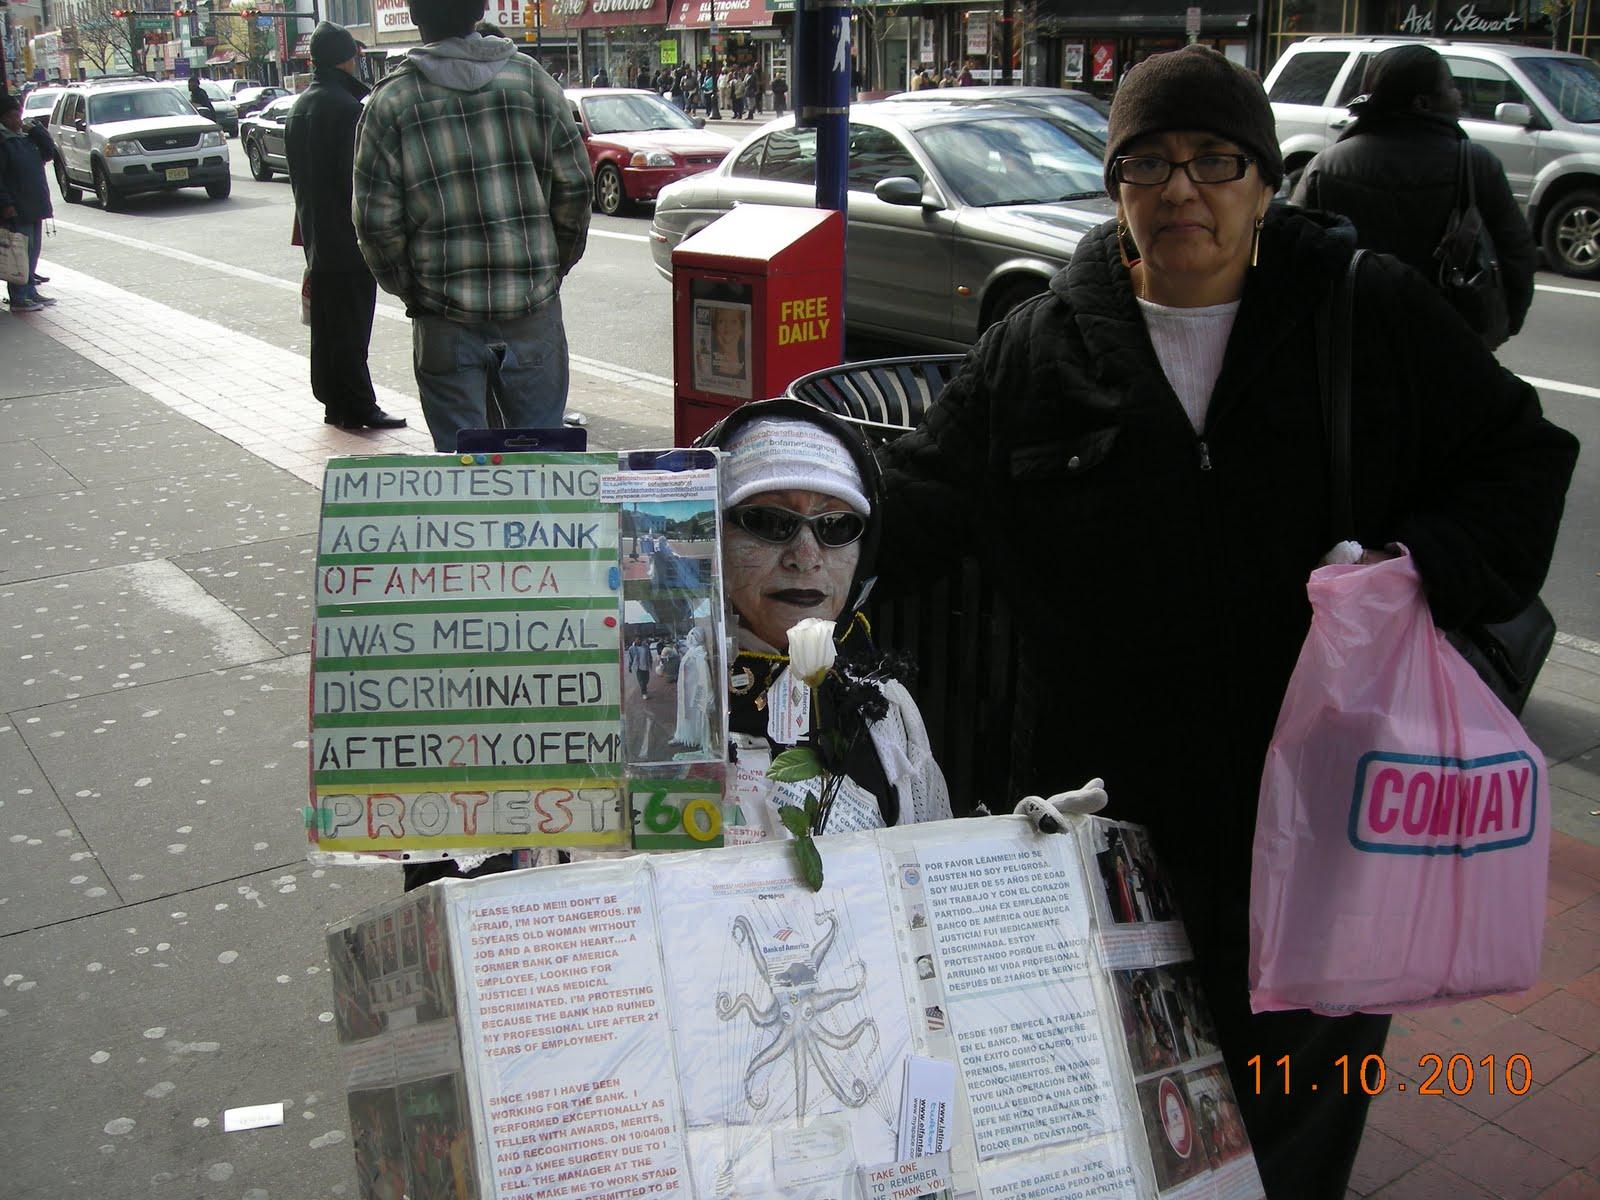 http://2.bp.blogspot.com/_DMNX5ixs5Tk/TNt4qWifKkI/AAAAAAAABKE/KLV-yHSjRes/s1600/New6-2.JPG